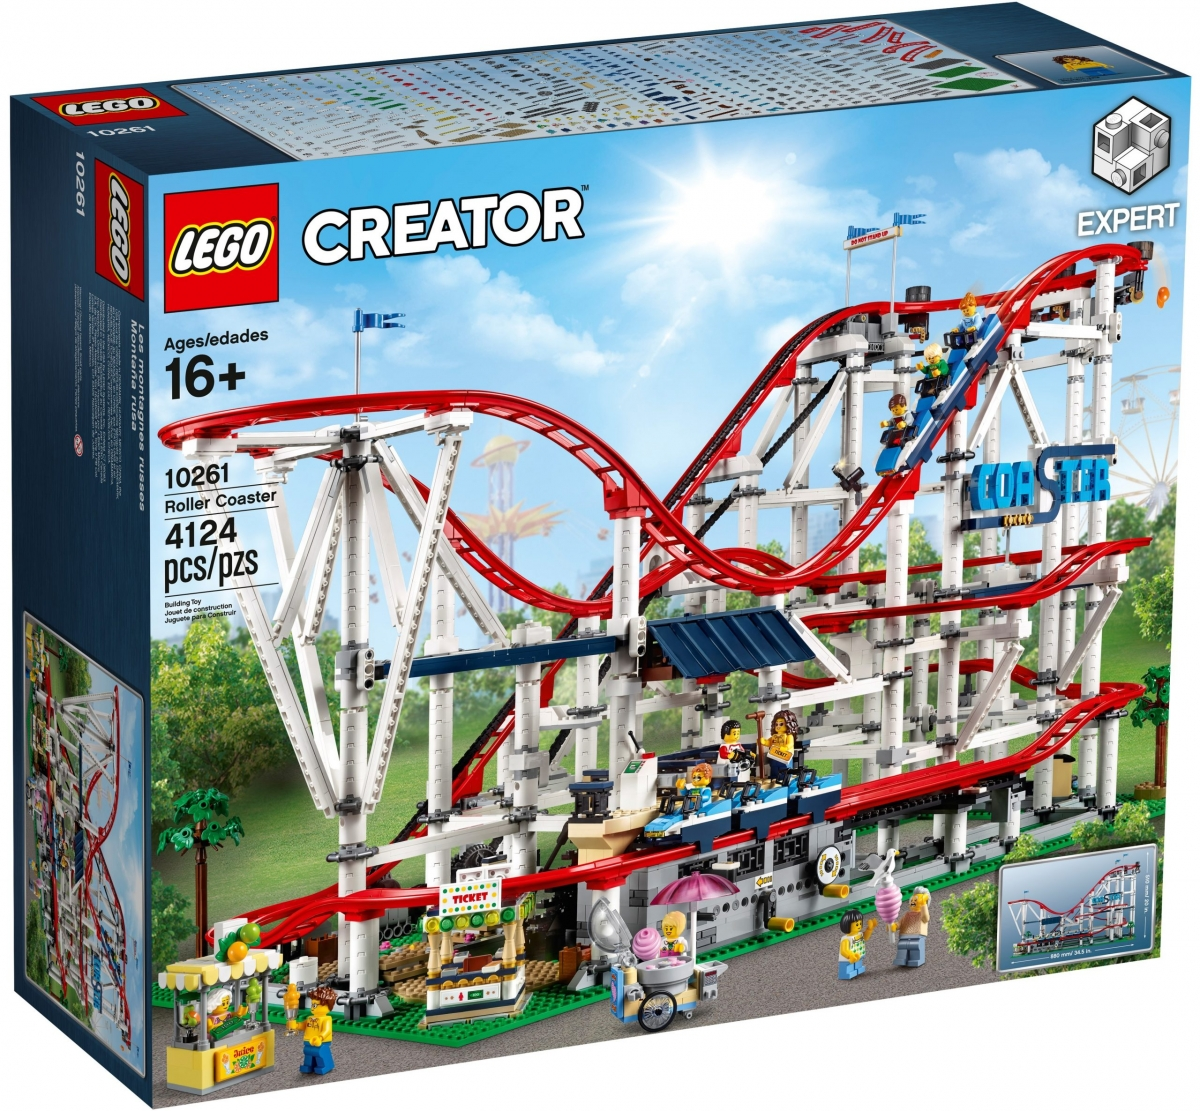 lego 10261 roller coaster scaled